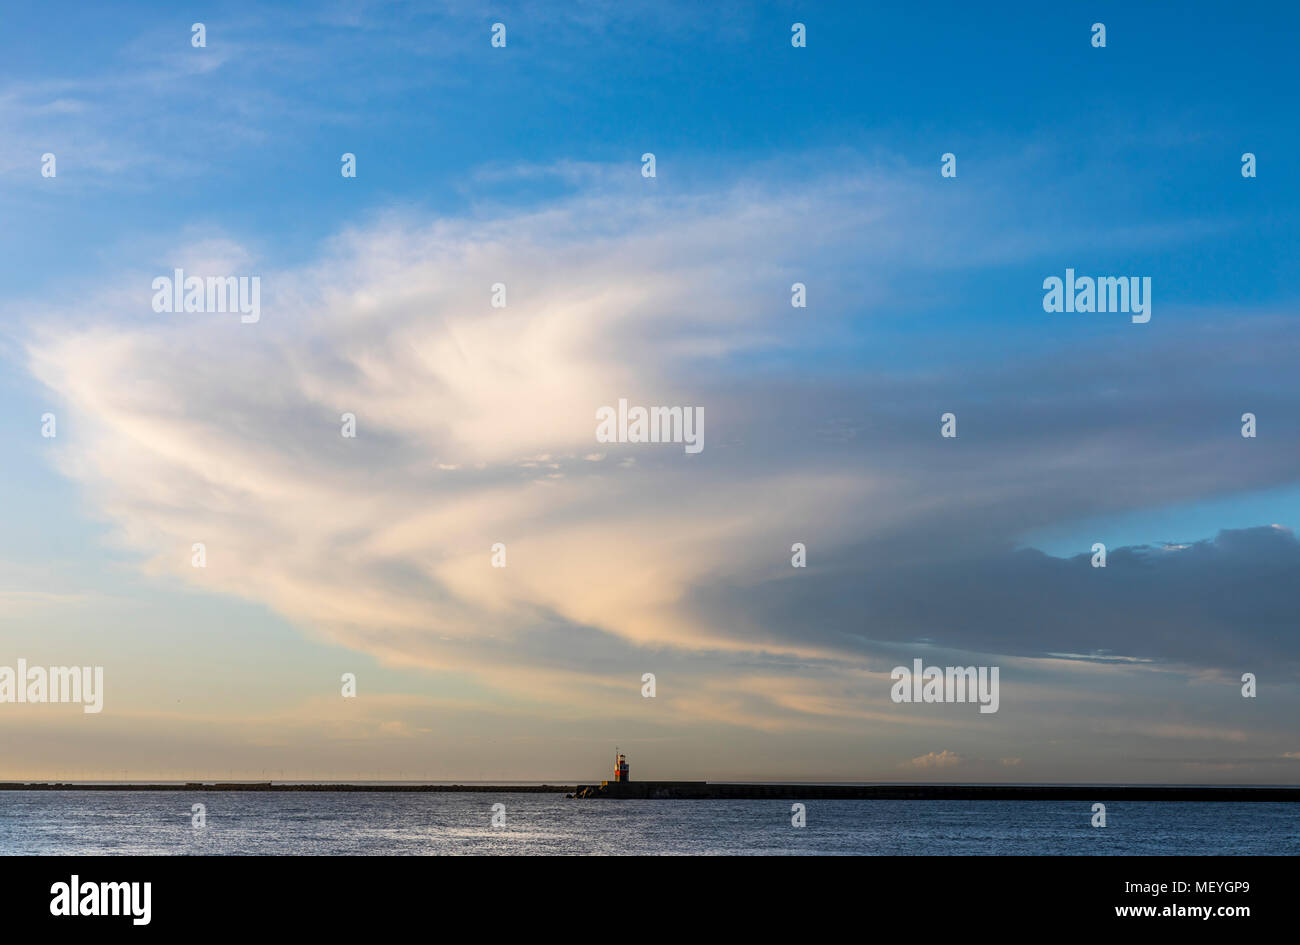 Harbor entrance of Ijmuiden in North Holland, Netherlands, cloud swirls, sea sign, - Stock Image